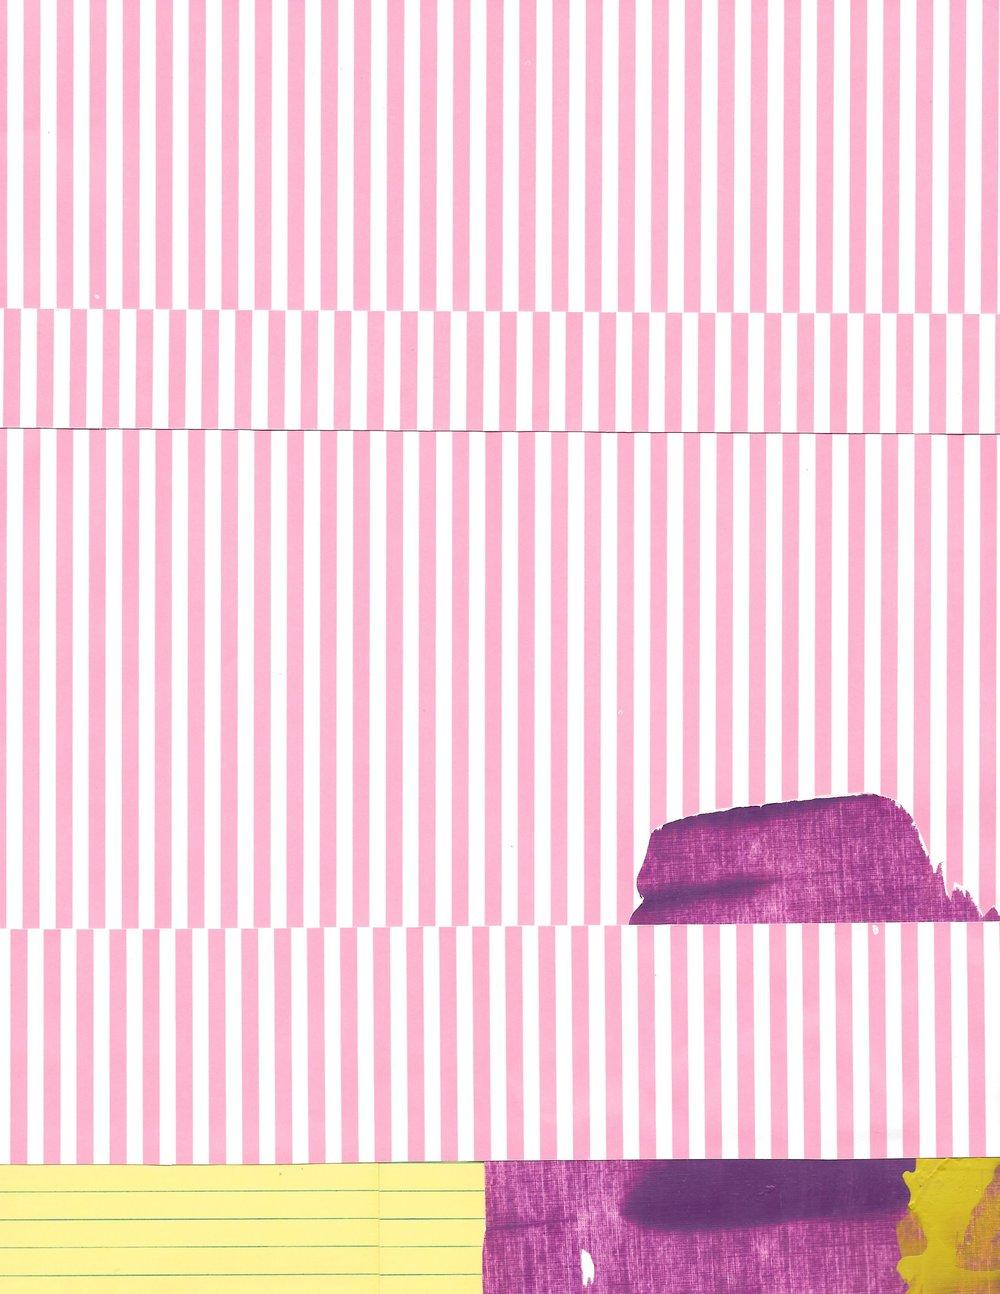 Pink aguacero